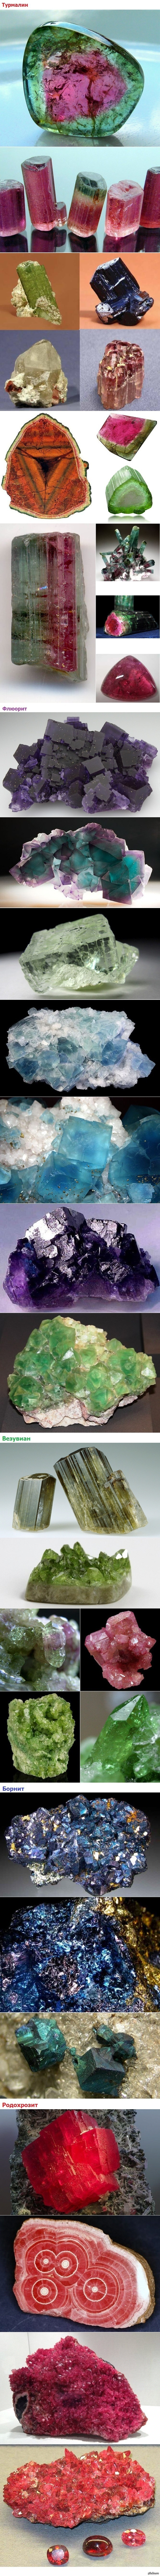 Минералы. минералы